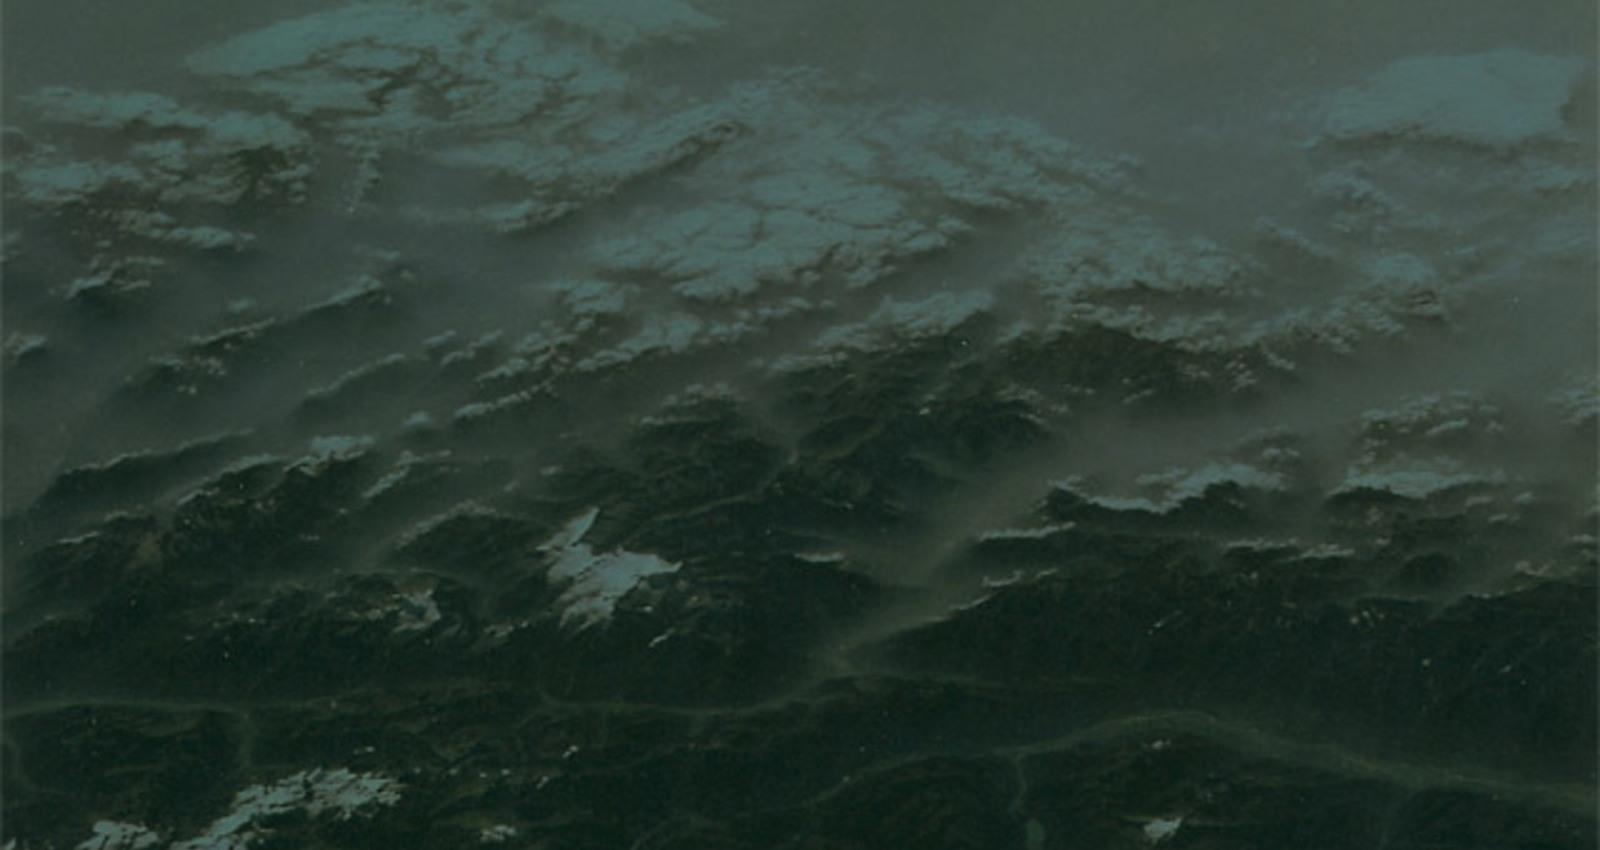 Ocean, Mountain, Rain Forest, River